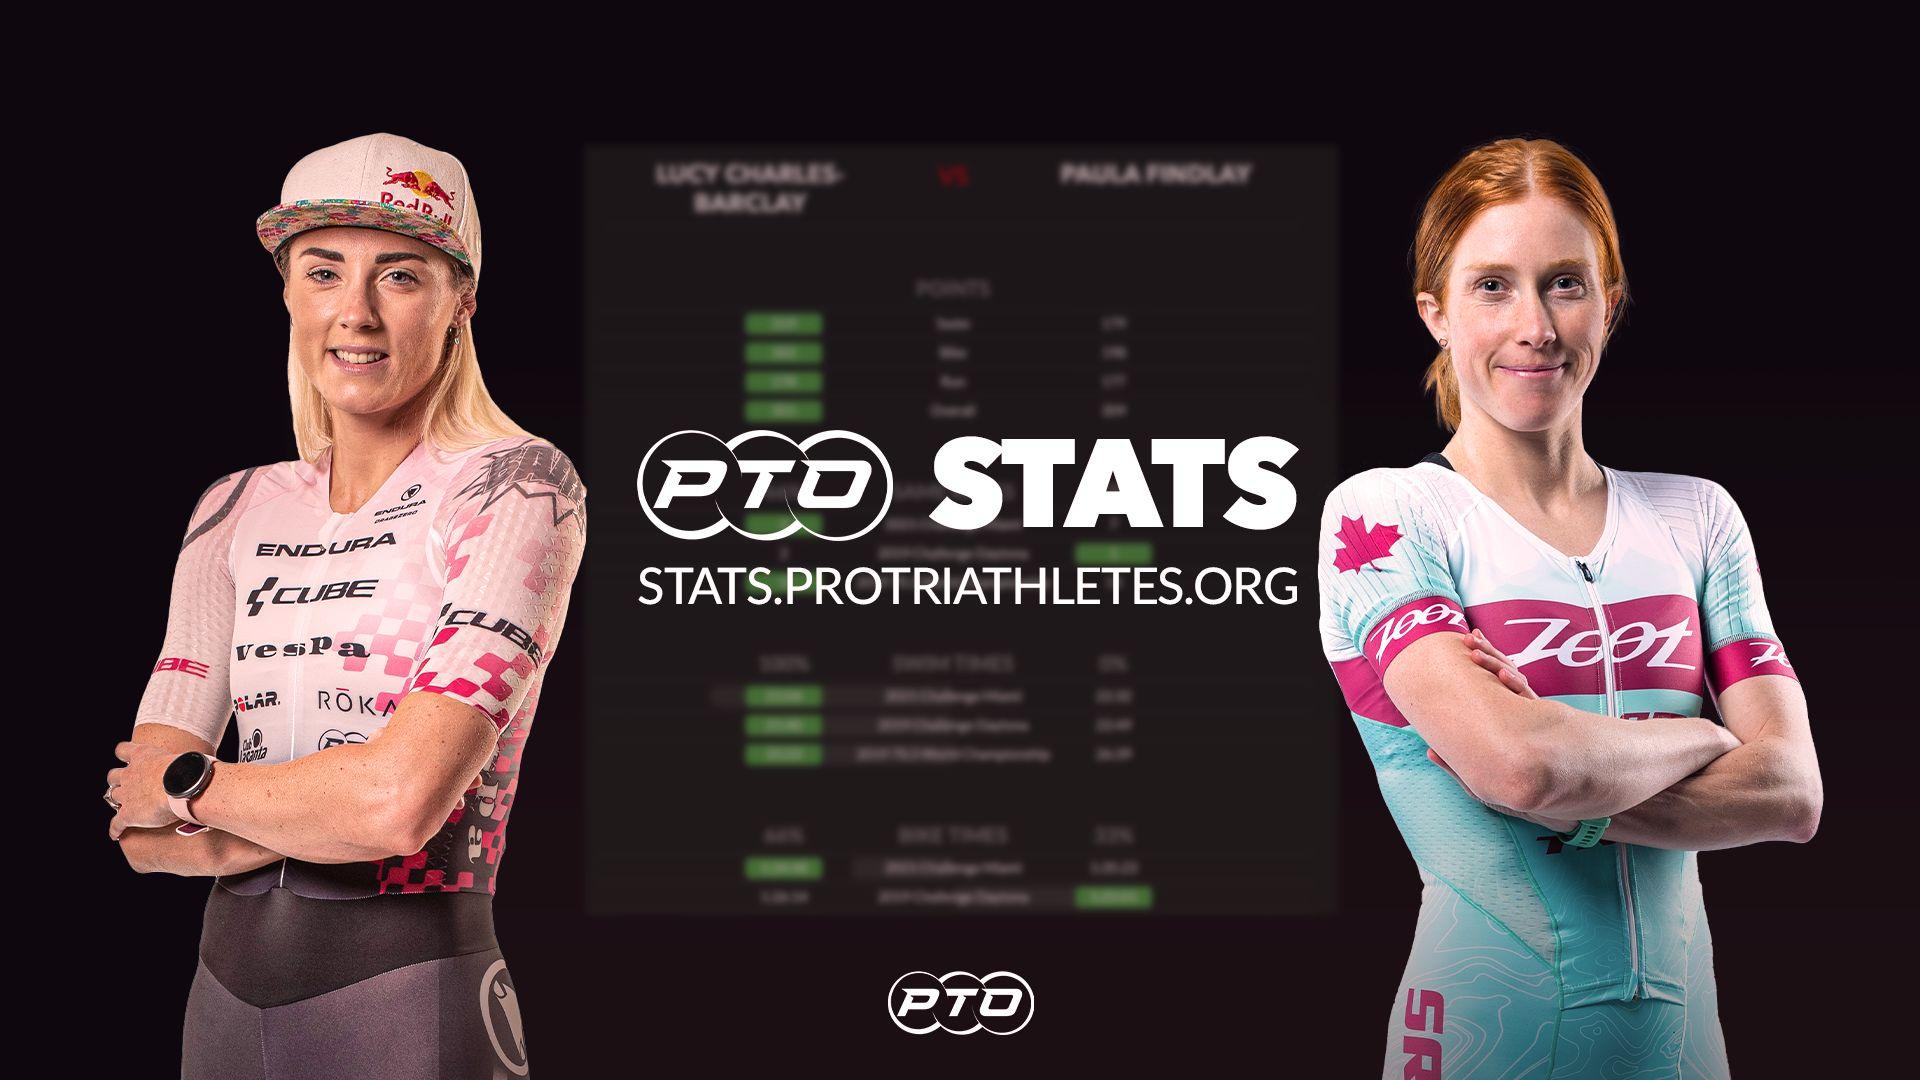 The Definitive Triathlon Stats Destination | PTO Stats